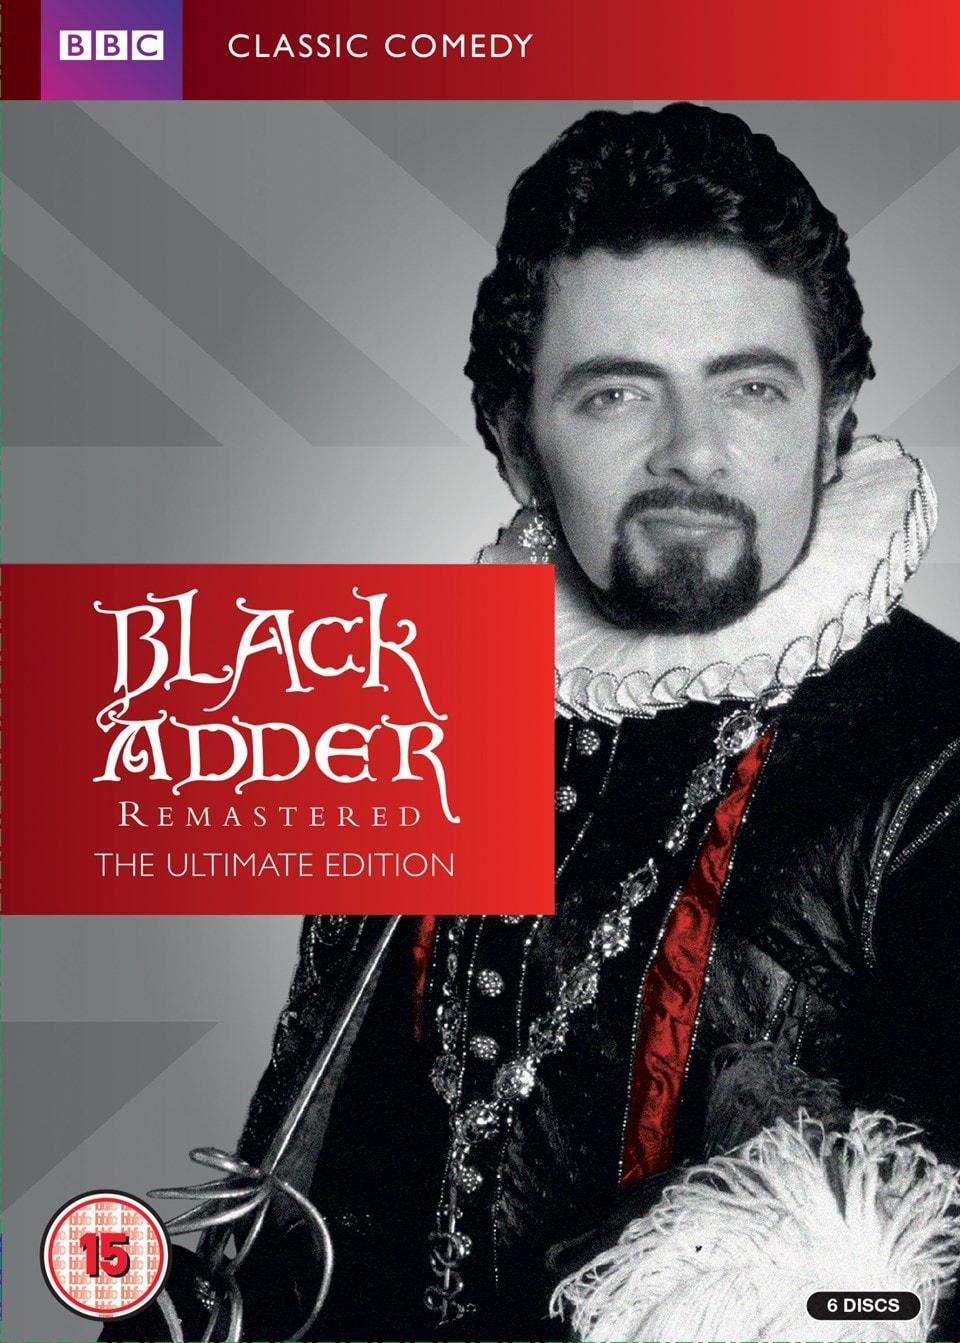 Blackadder: Remastered - The Ultimate Edition (hmv Exclusive) - 1